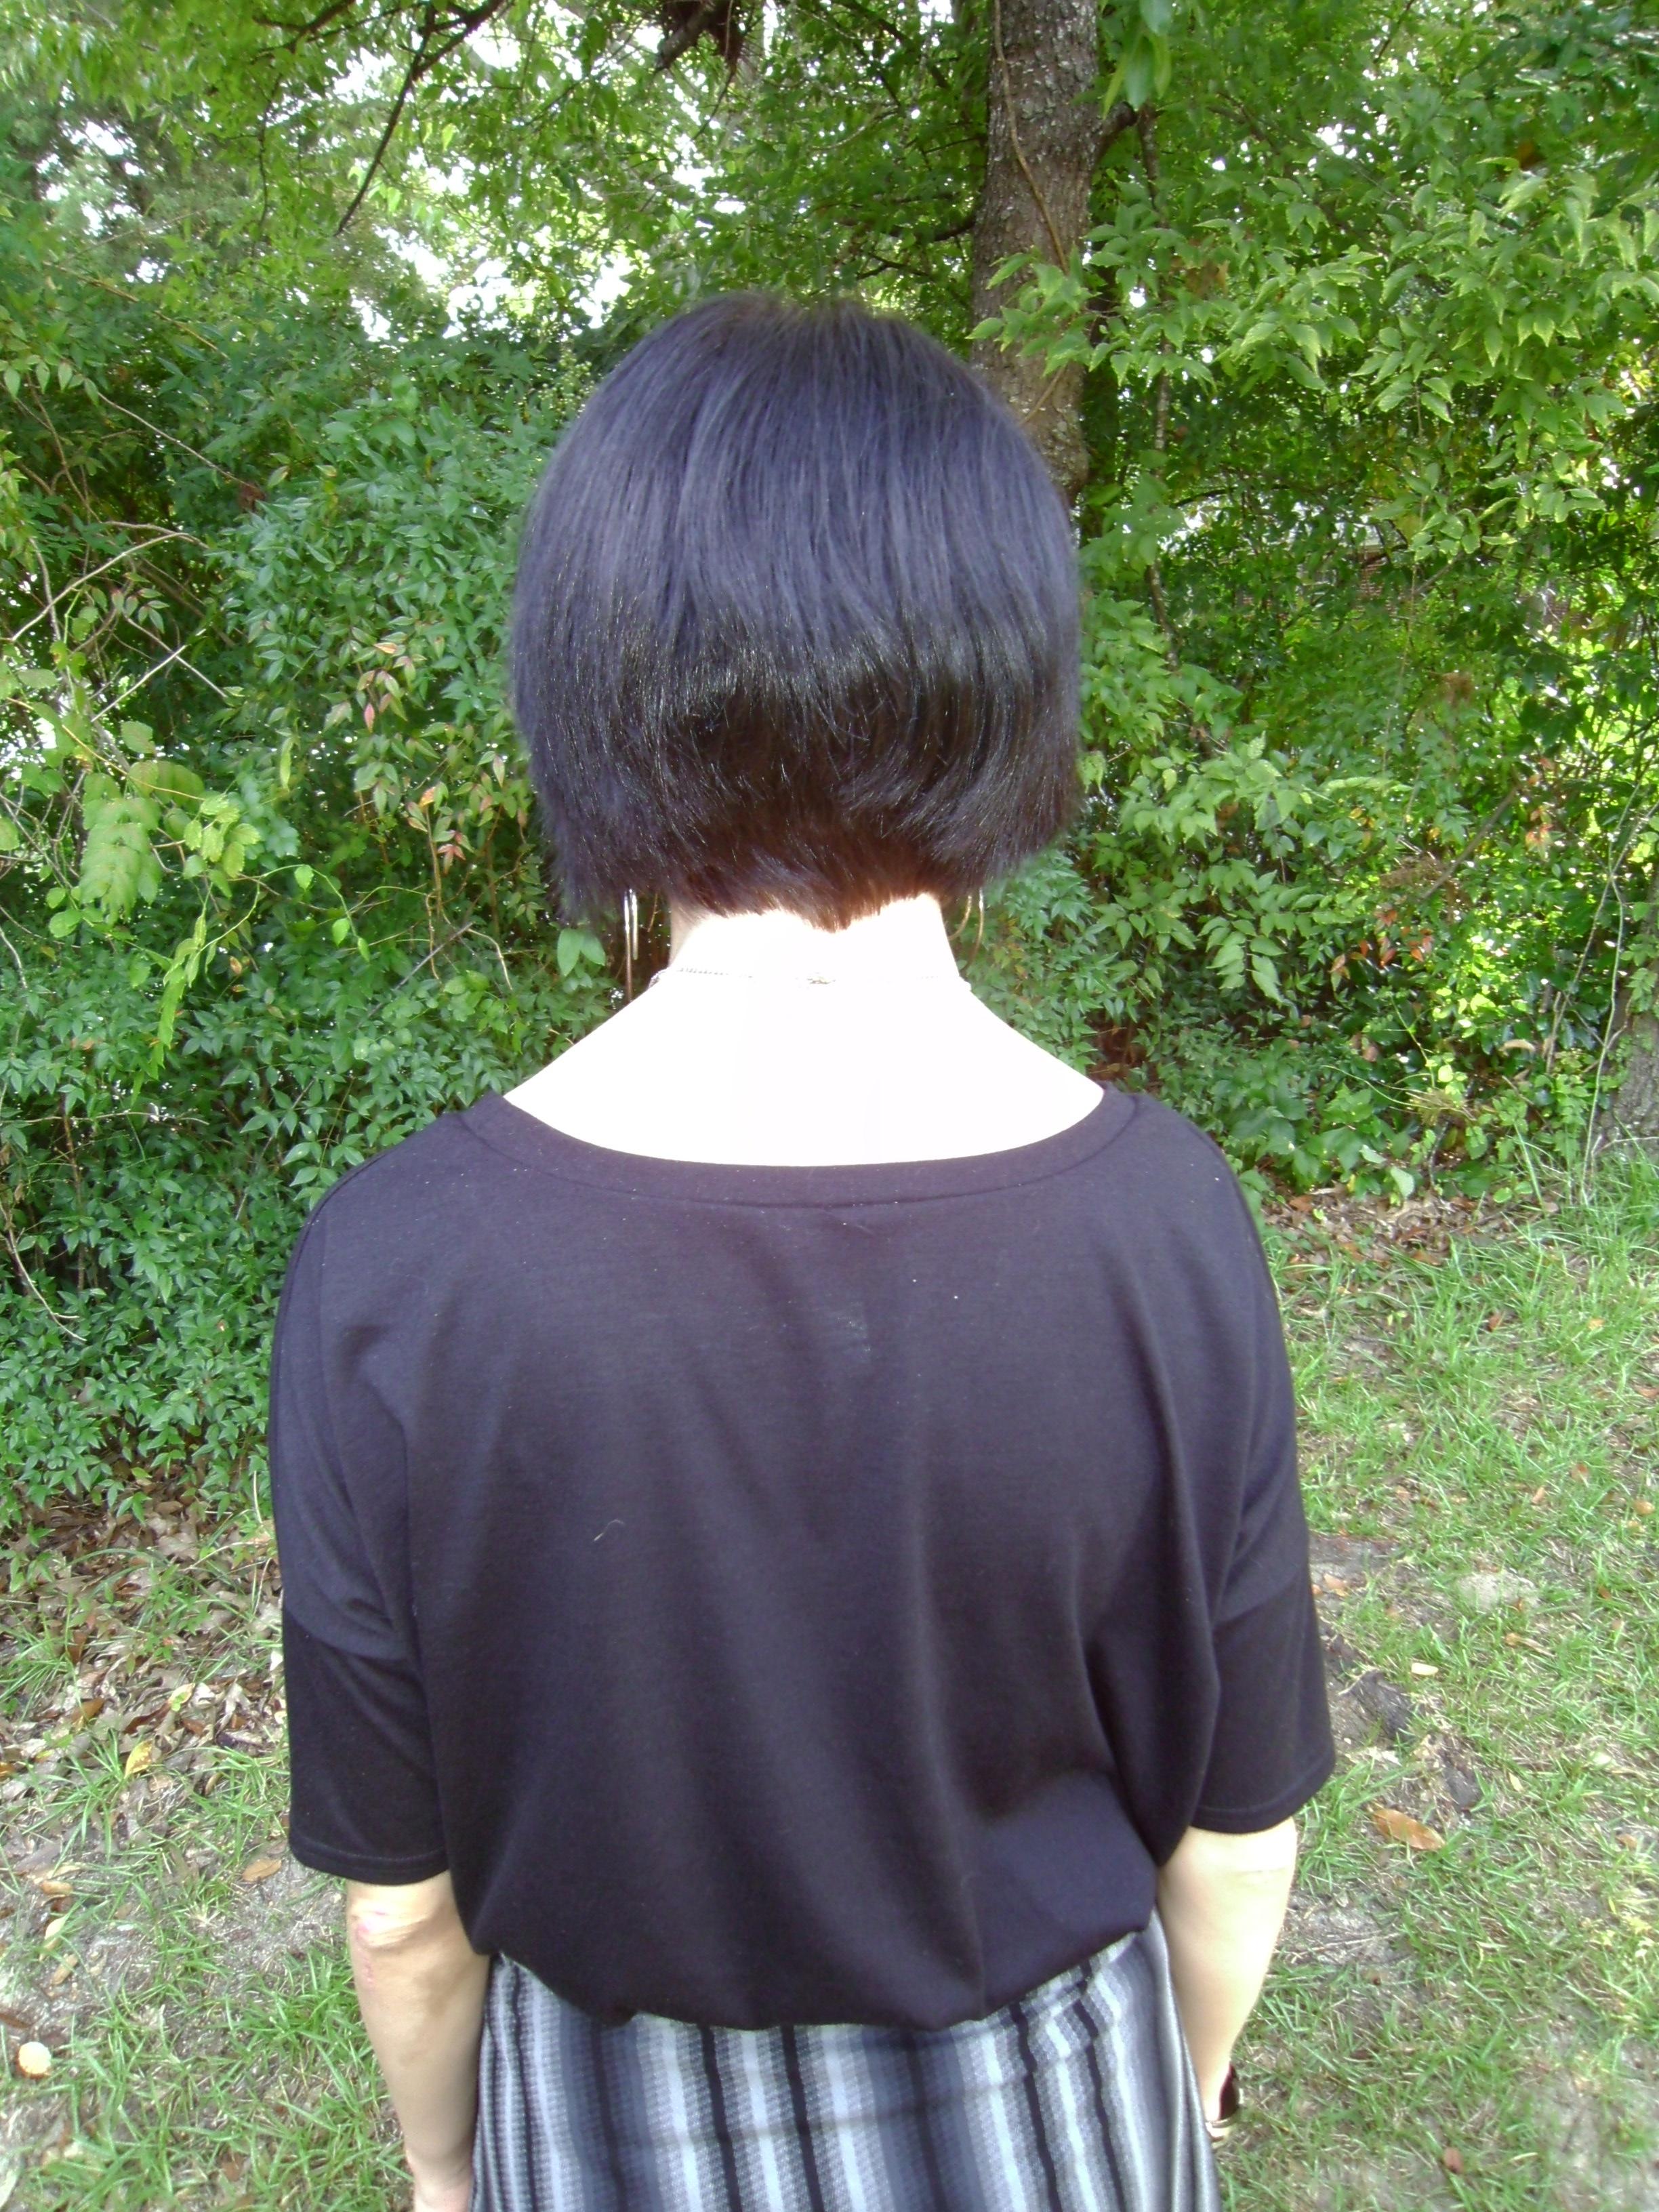 Day 55: Shirt is Skirt II 5